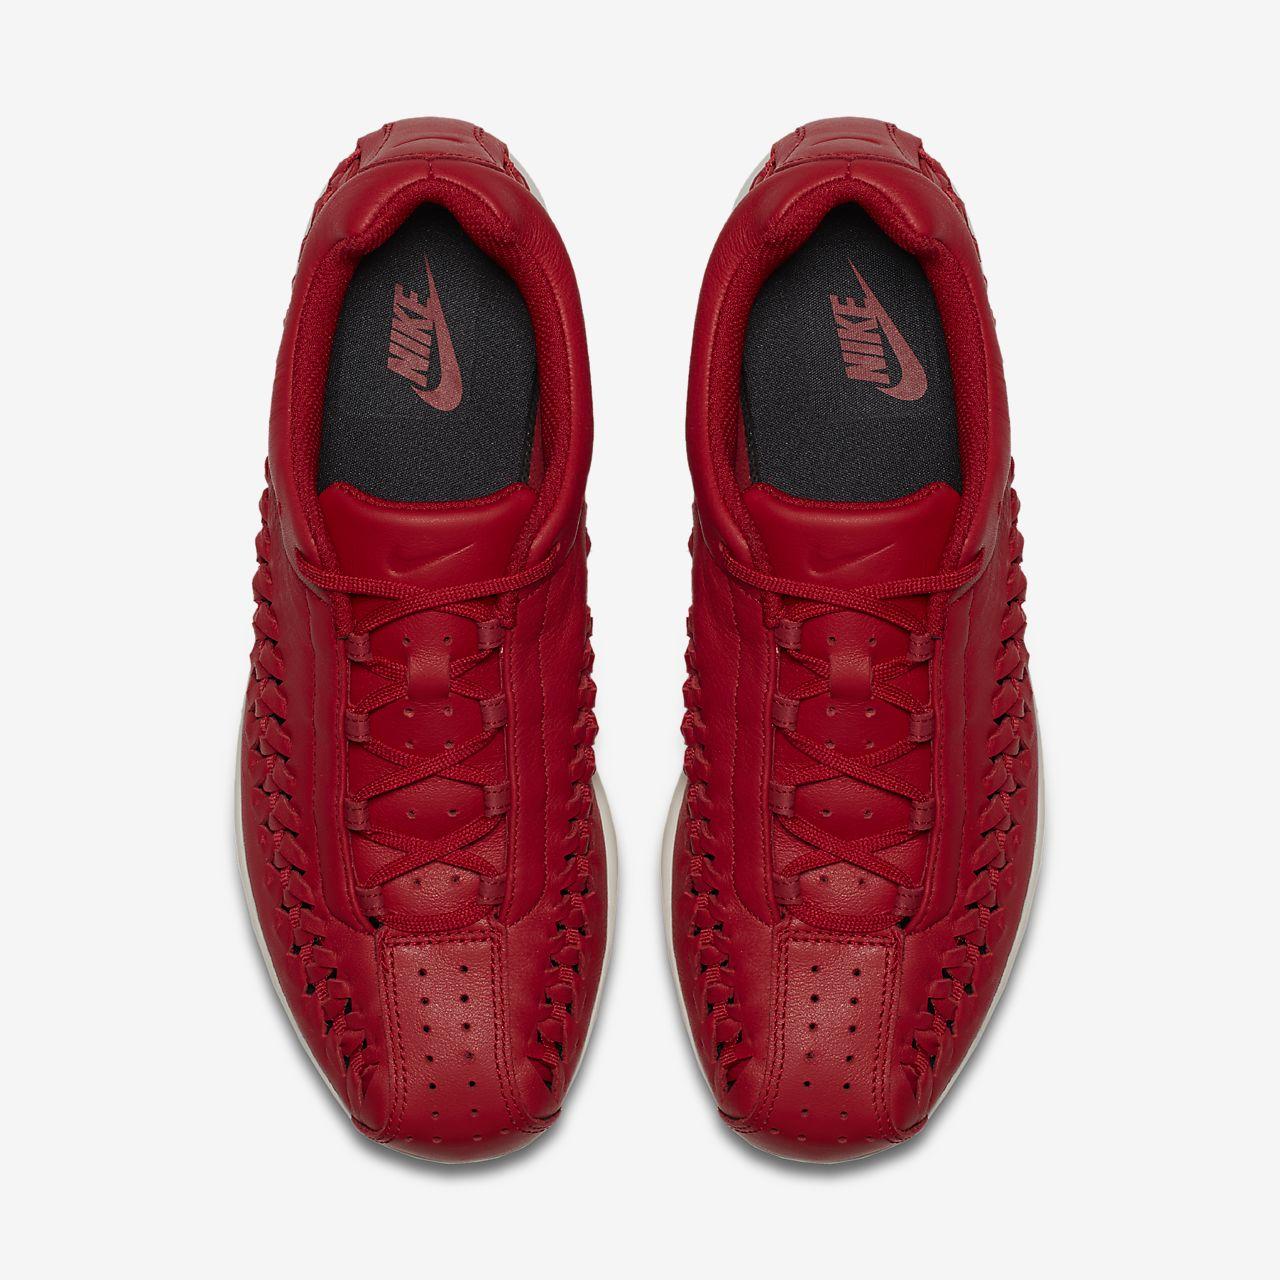 57e402a4e55 Nike Mayfly Woven Men s Shoe. Nike.com AU